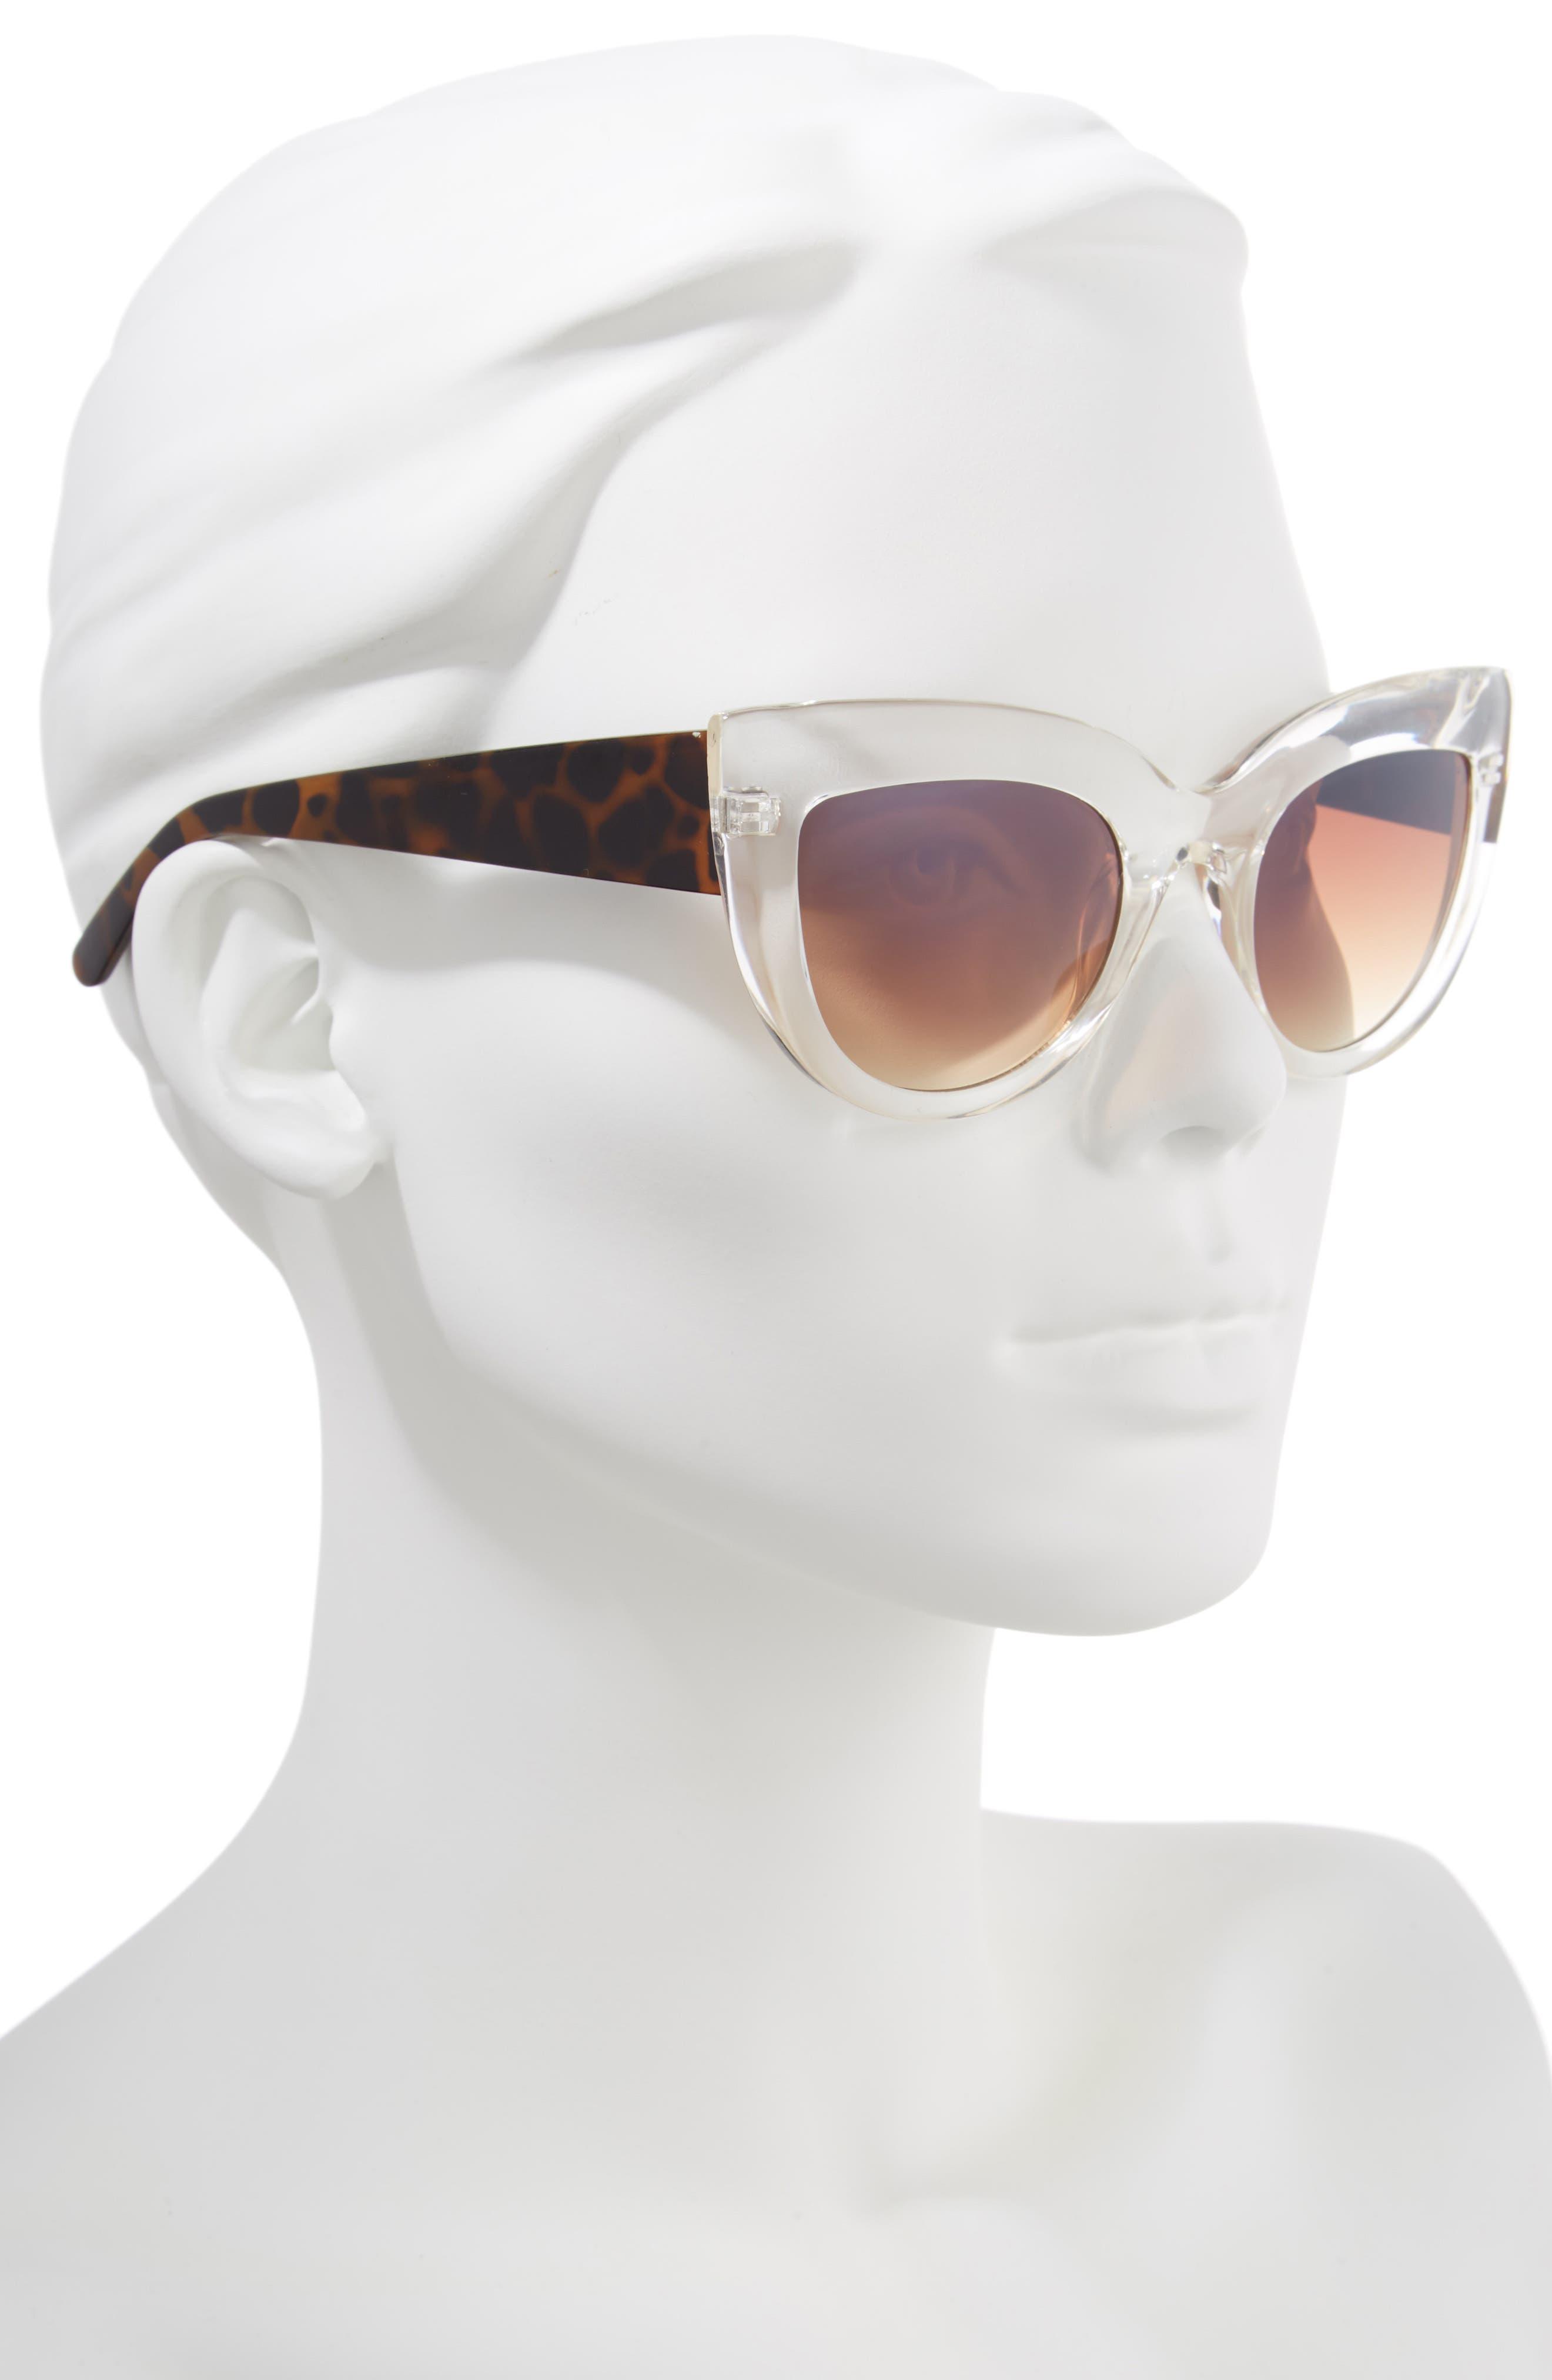 Translucent Cat Eye Sunglasses,                             Alternate thumbnail 2, color,                             Tort/ Clear